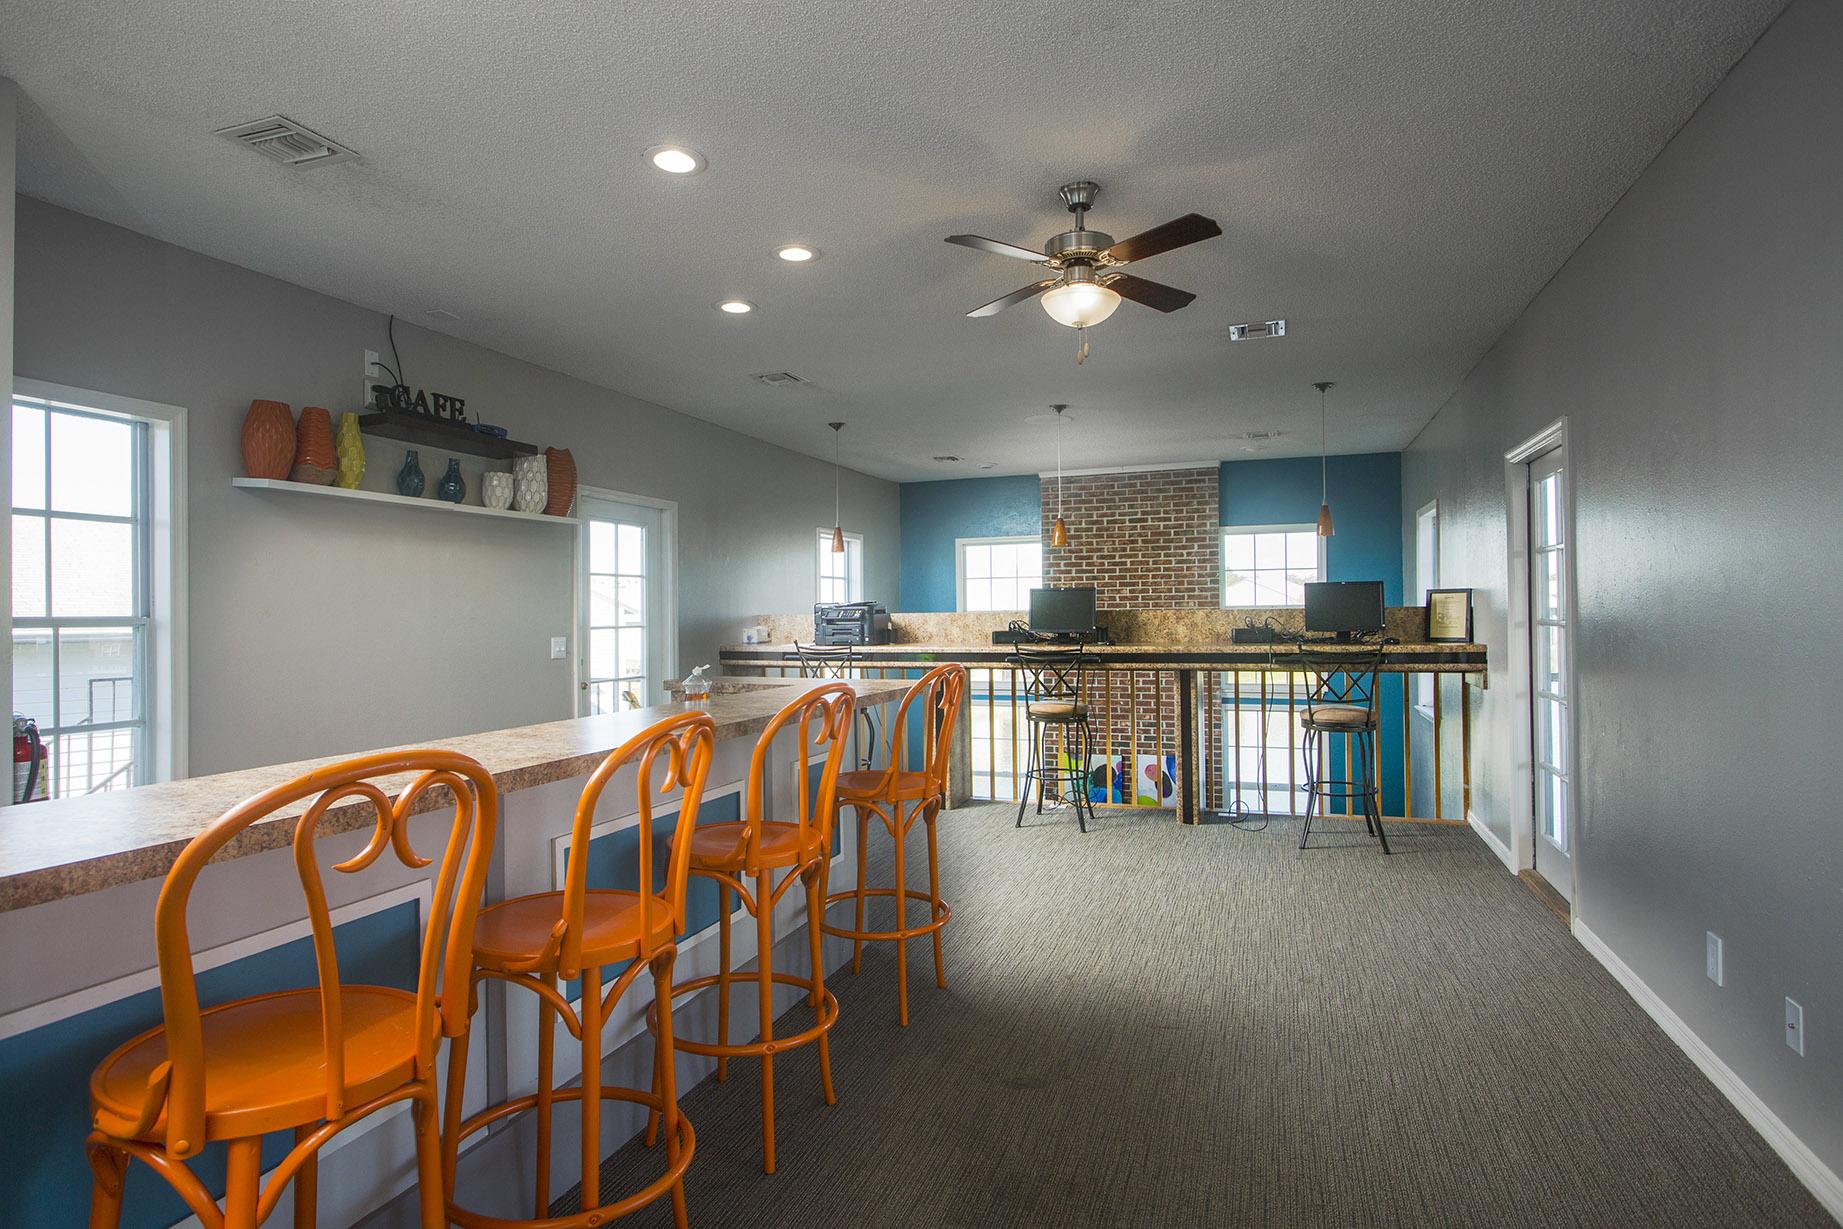 CharlestonLandings-Rental-Apartment-Brandon-Florida-Media-Center